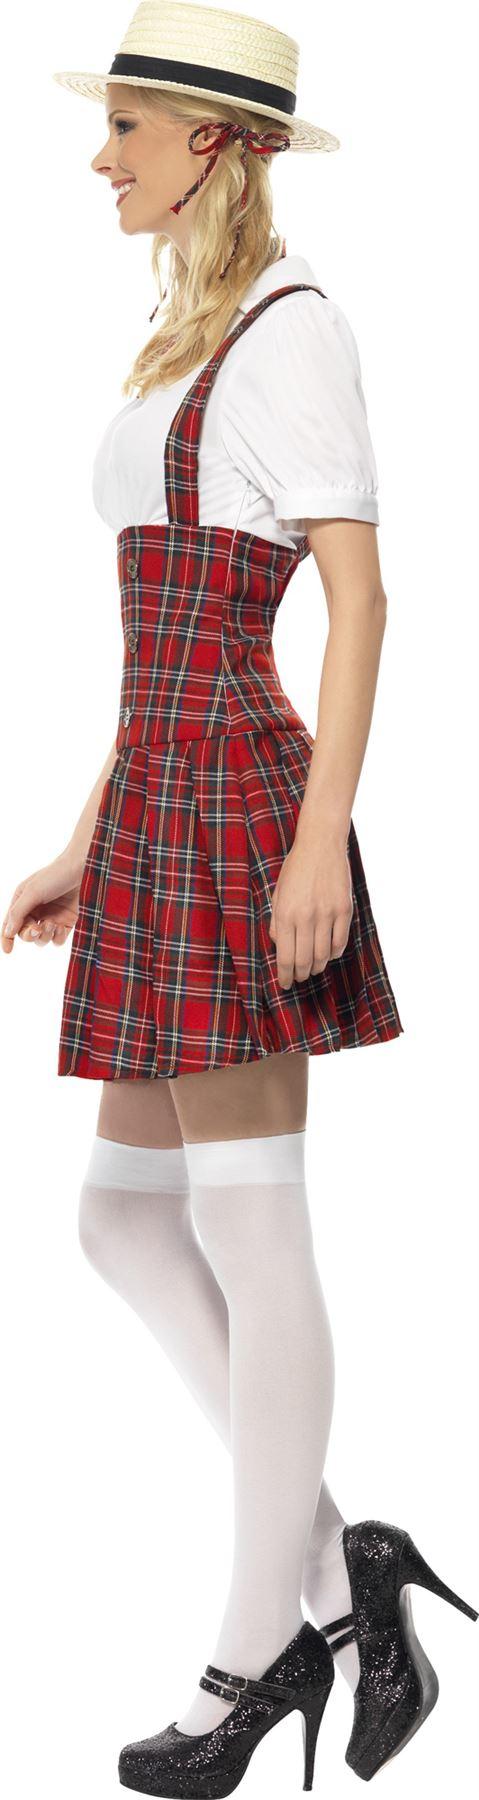 Ladies Sexy Schoolgirl Fancy Dress Costume Tartan School Girl Uniform Outfit | eBay